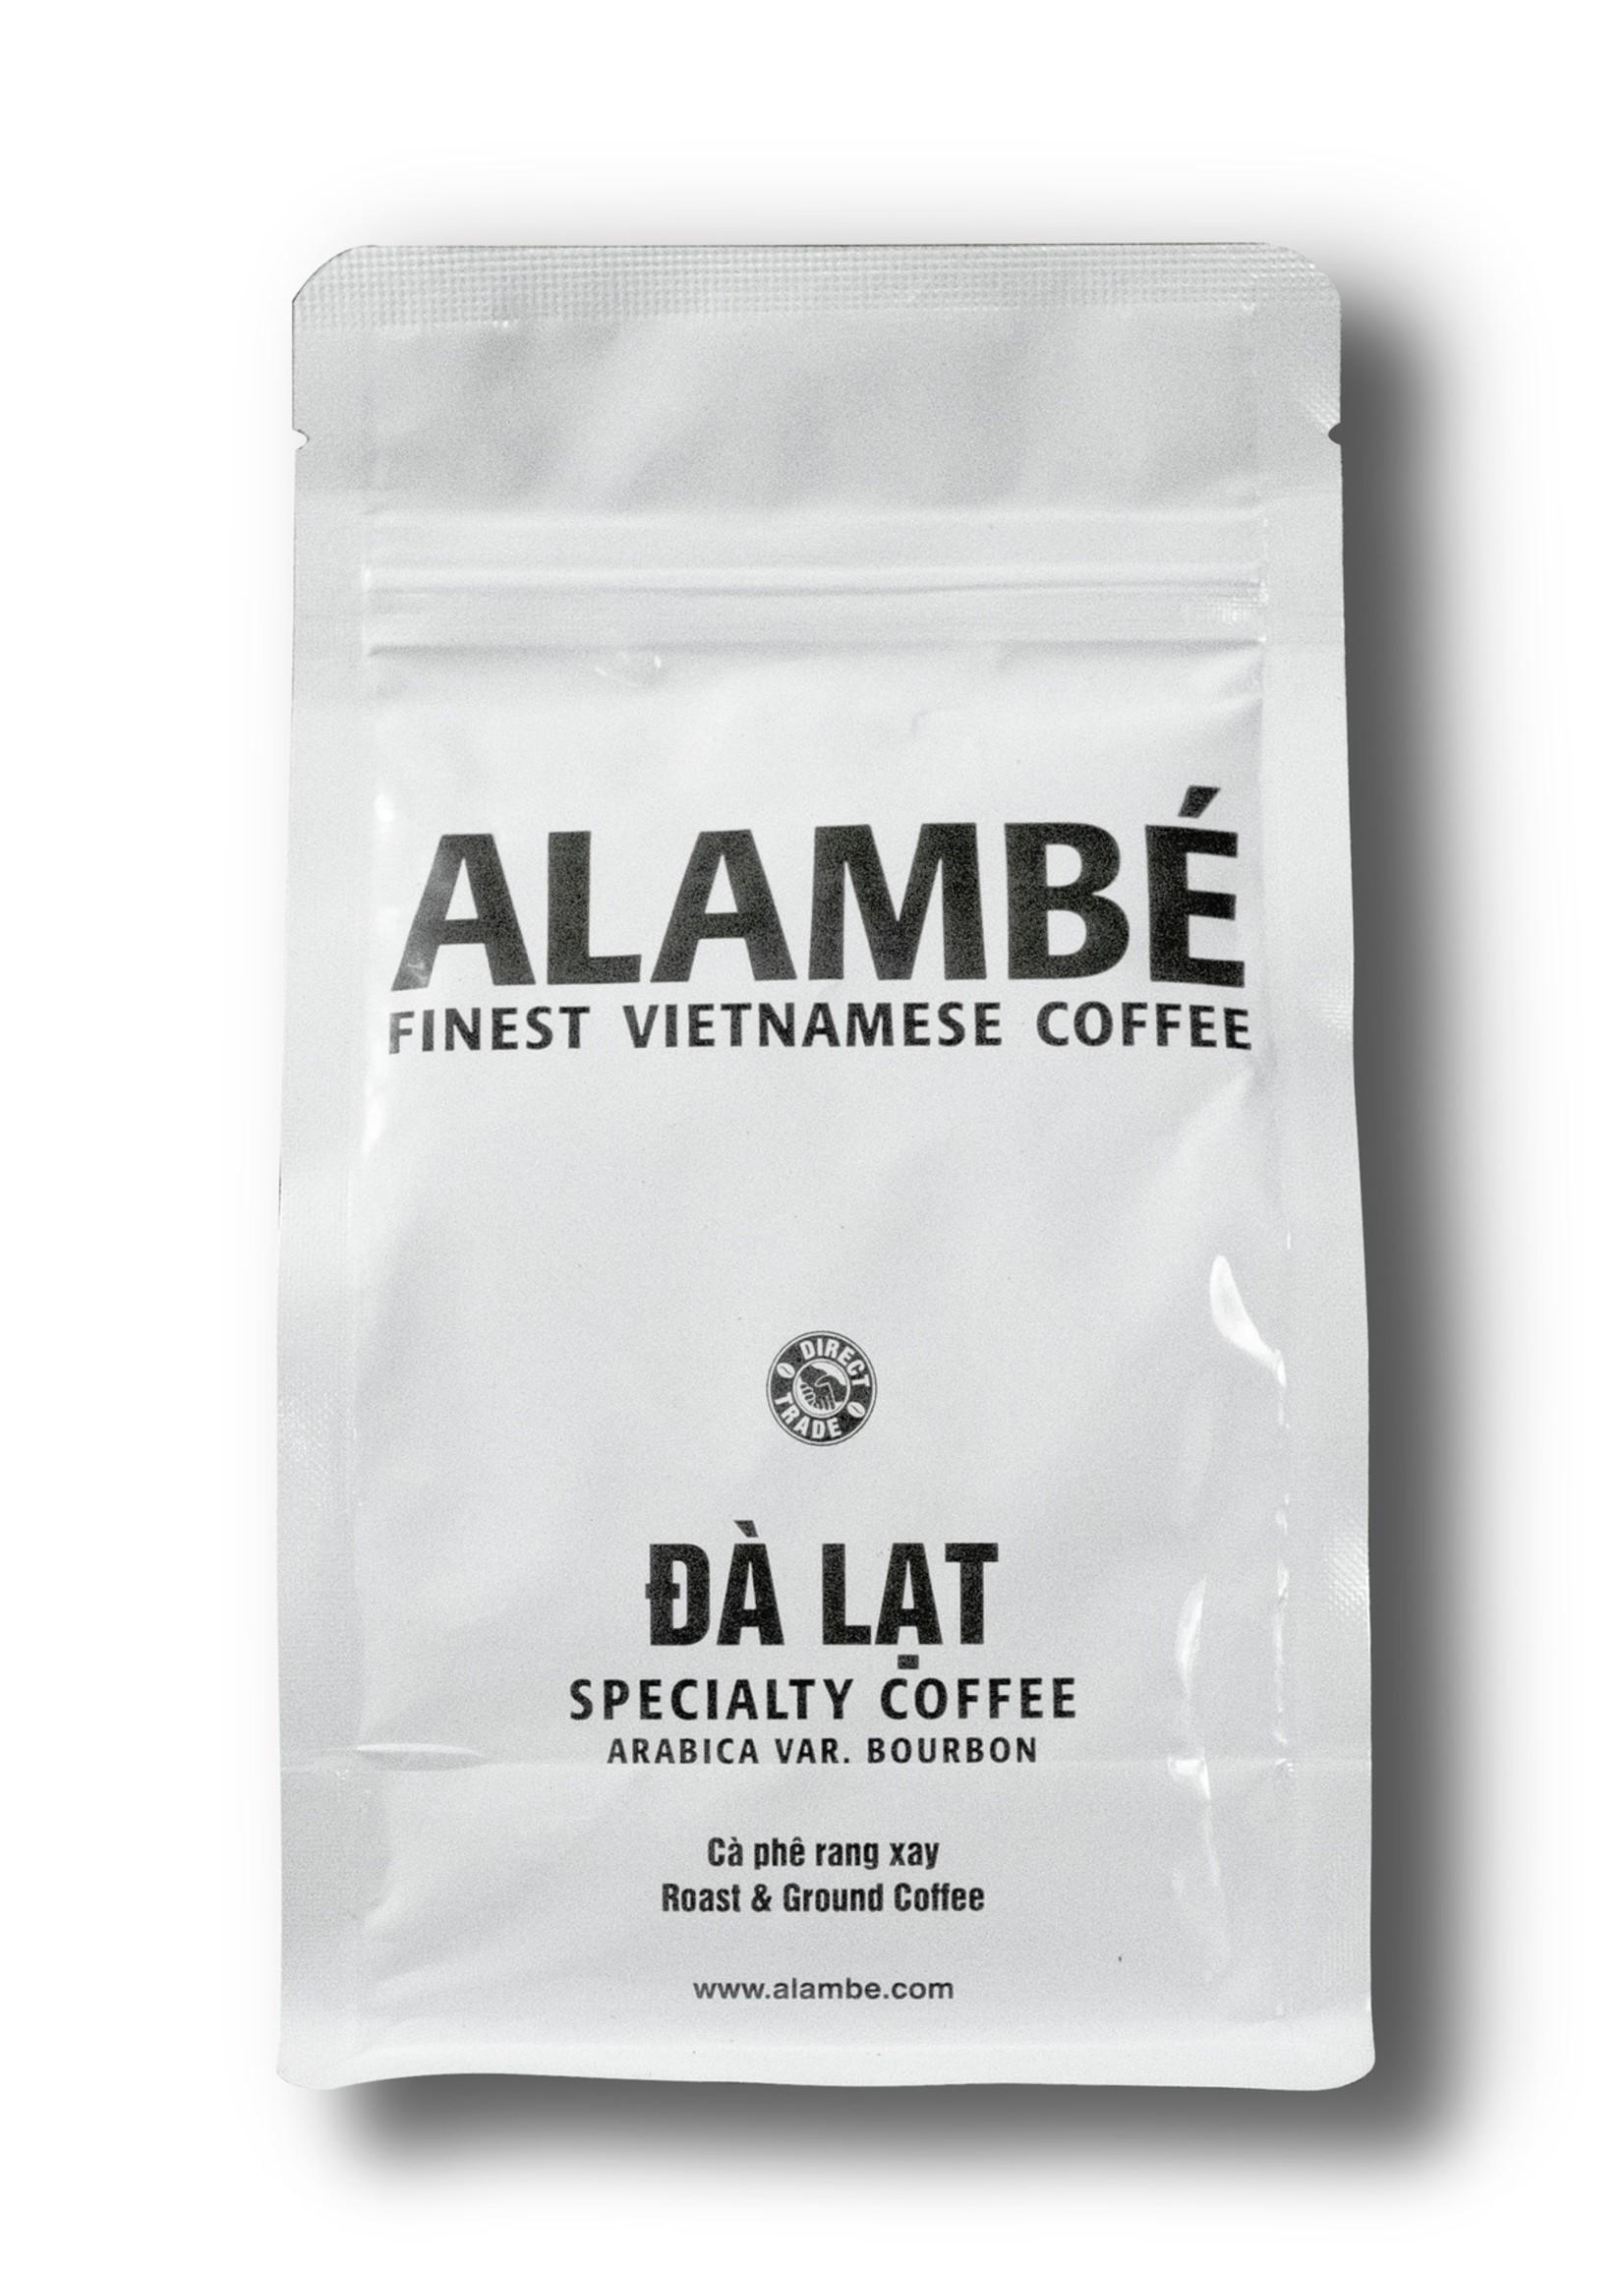 Alambé - Finest Vietnamese Coffee Da Lat – 100% Arabica Bourbon specialty coffee from Vietnam (230g whole beans)